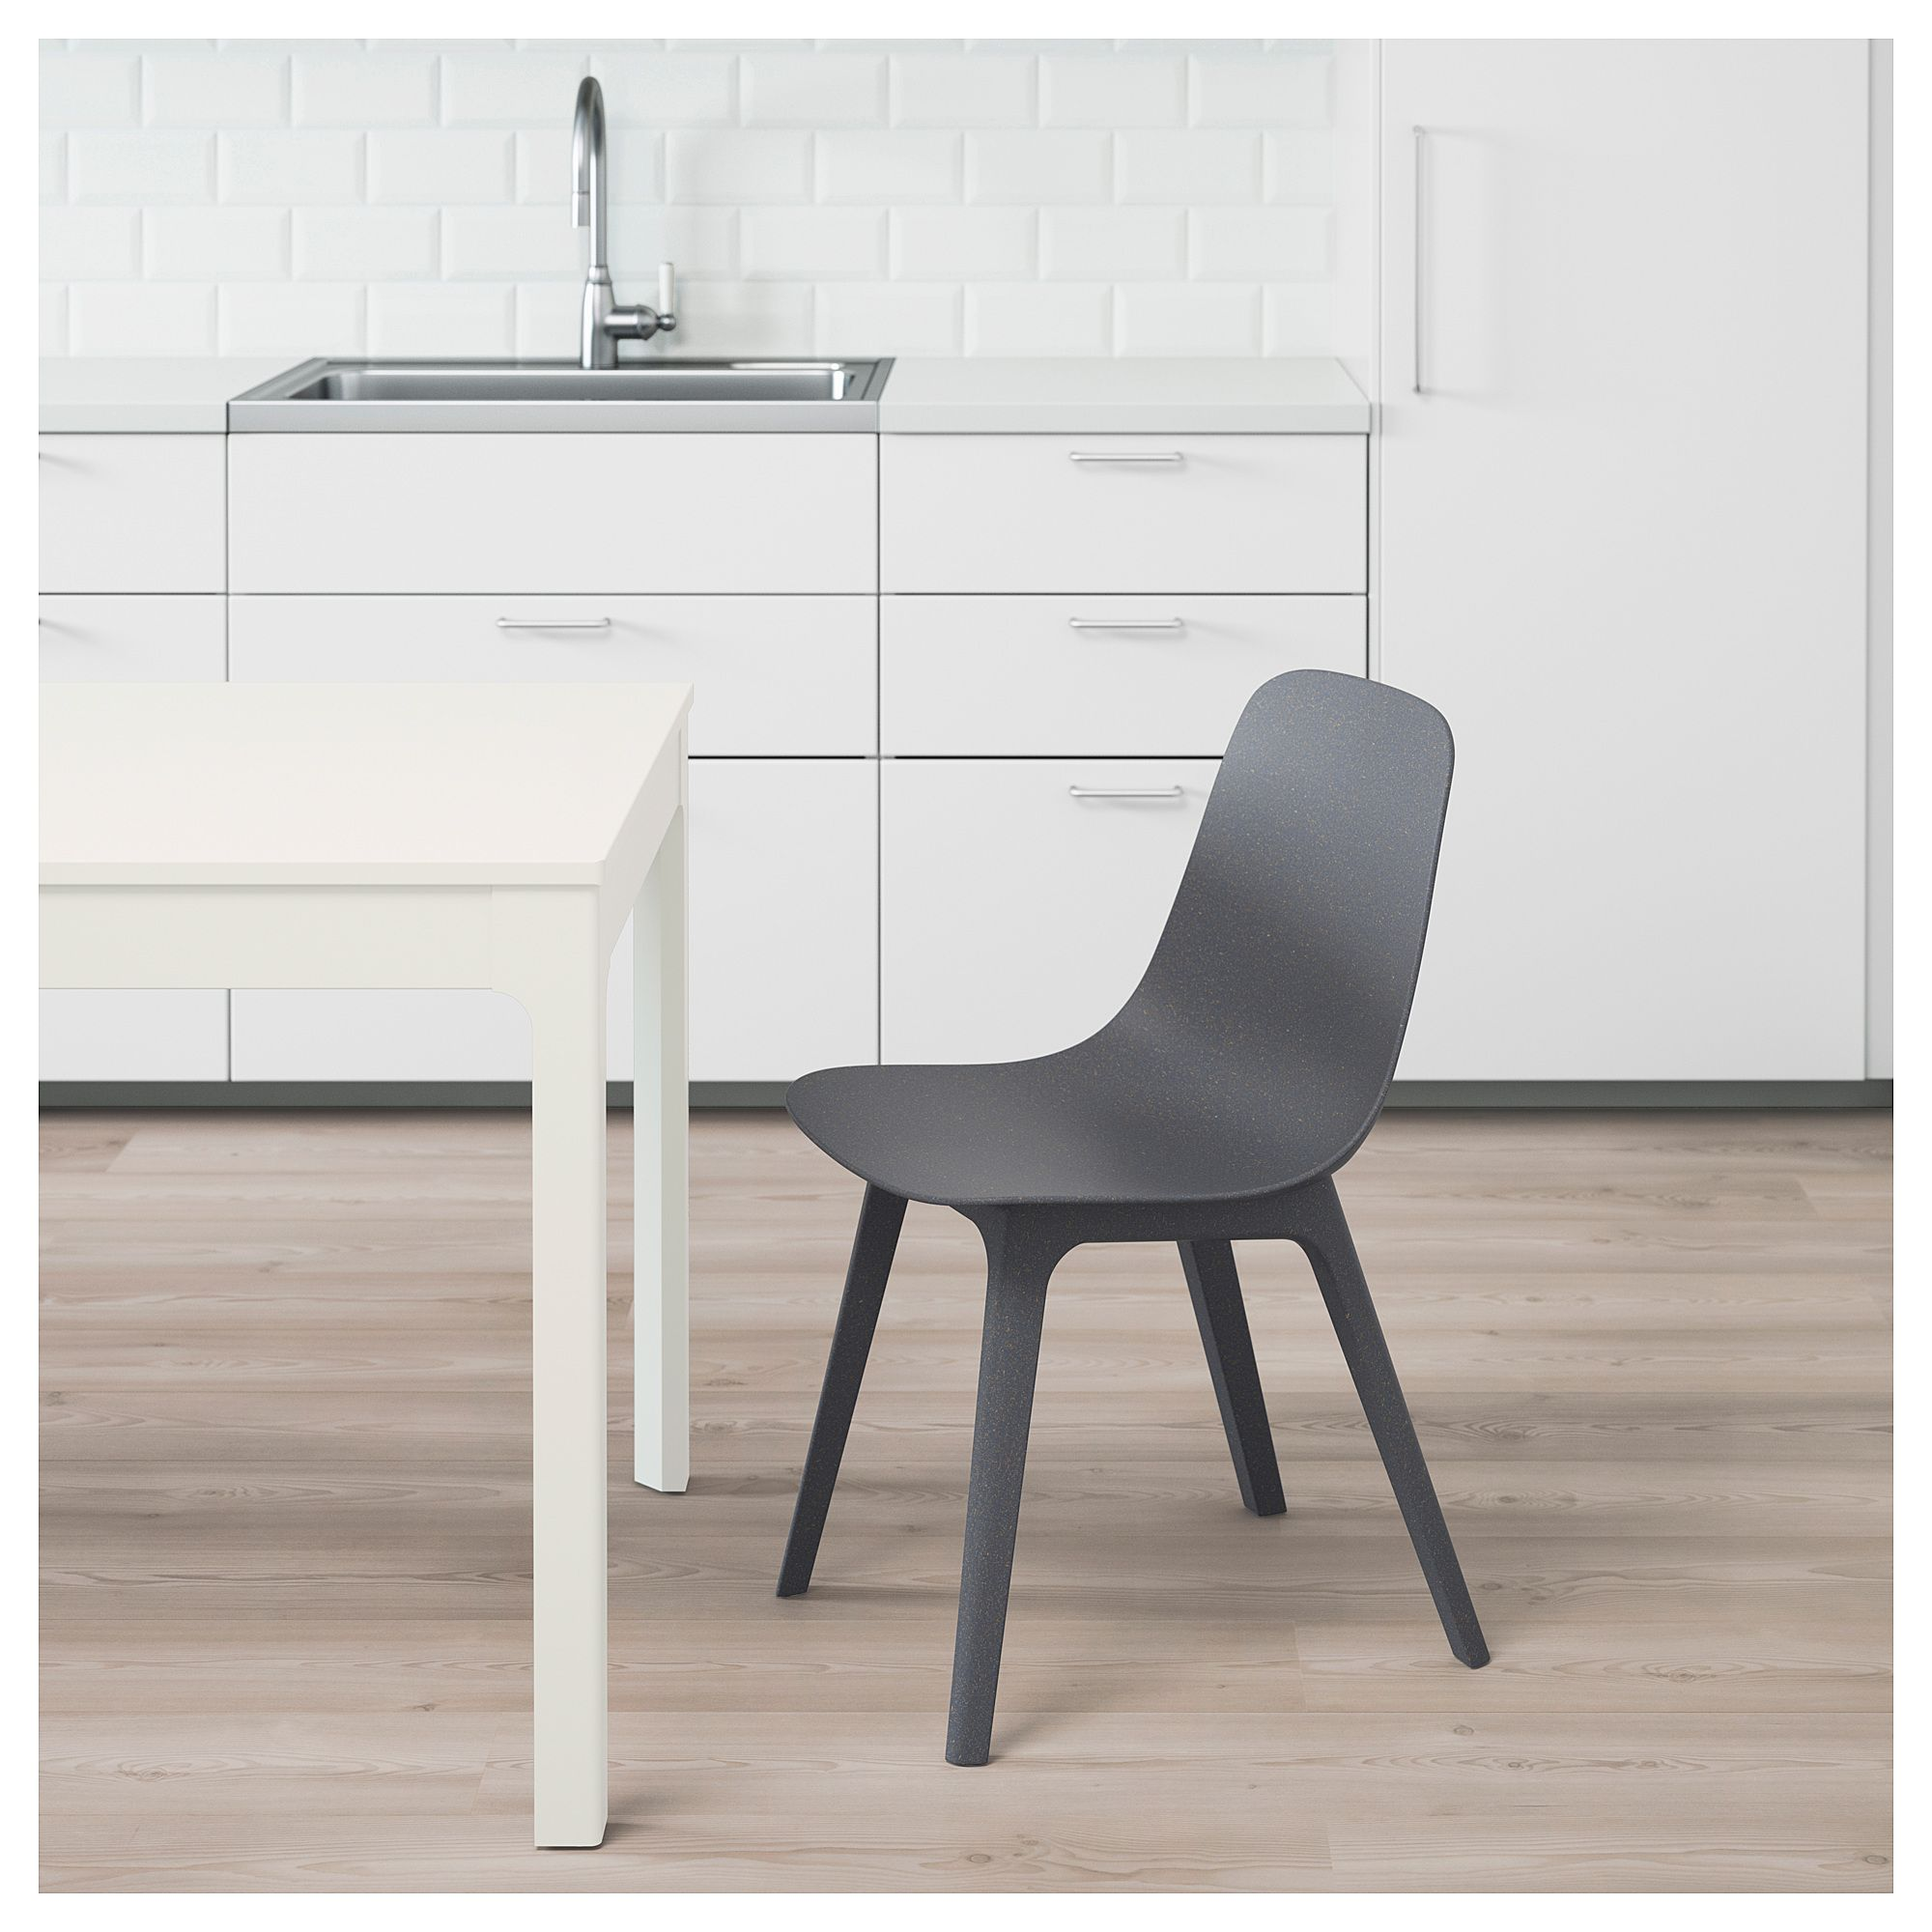 Ikea Tavoli Da Giardino Allungabili.Odger Chair Blue Sedia Ikea Tavolo Allungabile Ikea E Idee